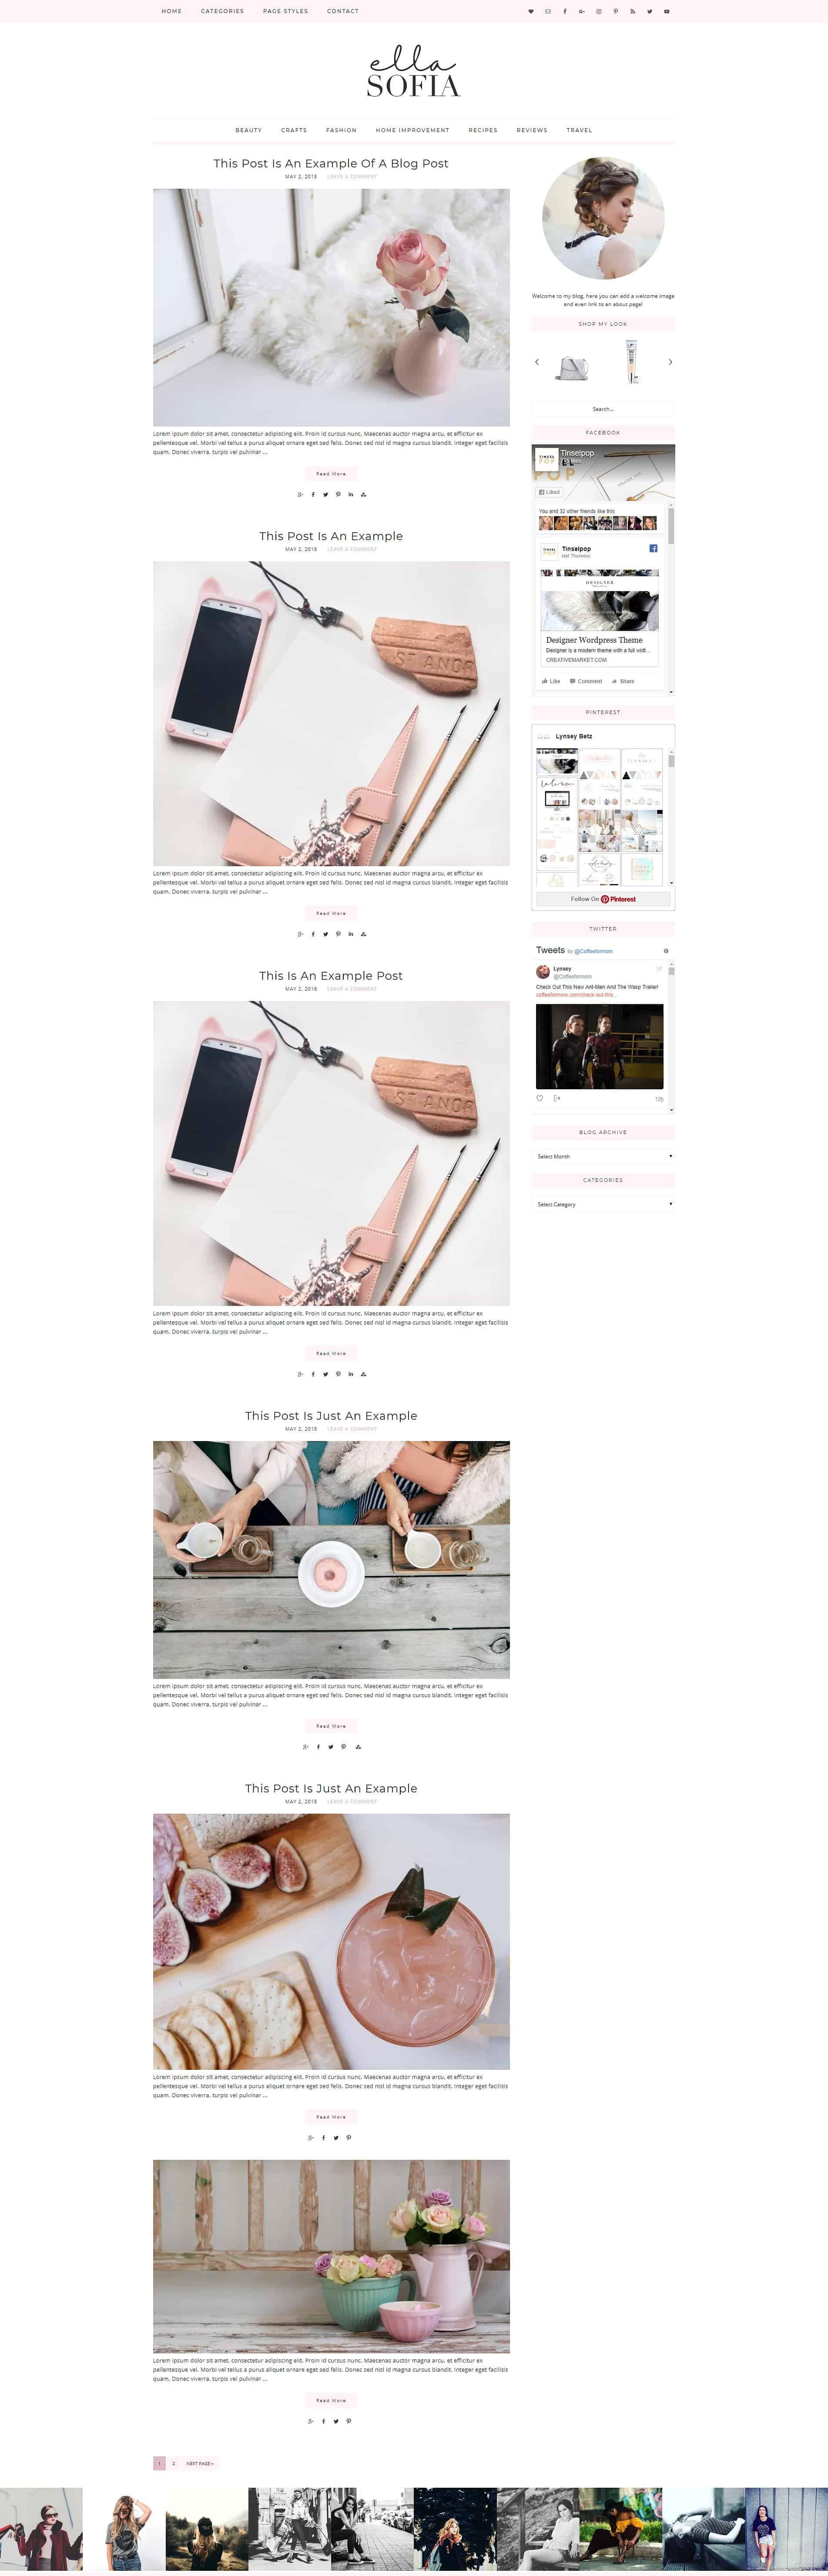 Feminine Cheap WordPress Theme - Ella Sofia